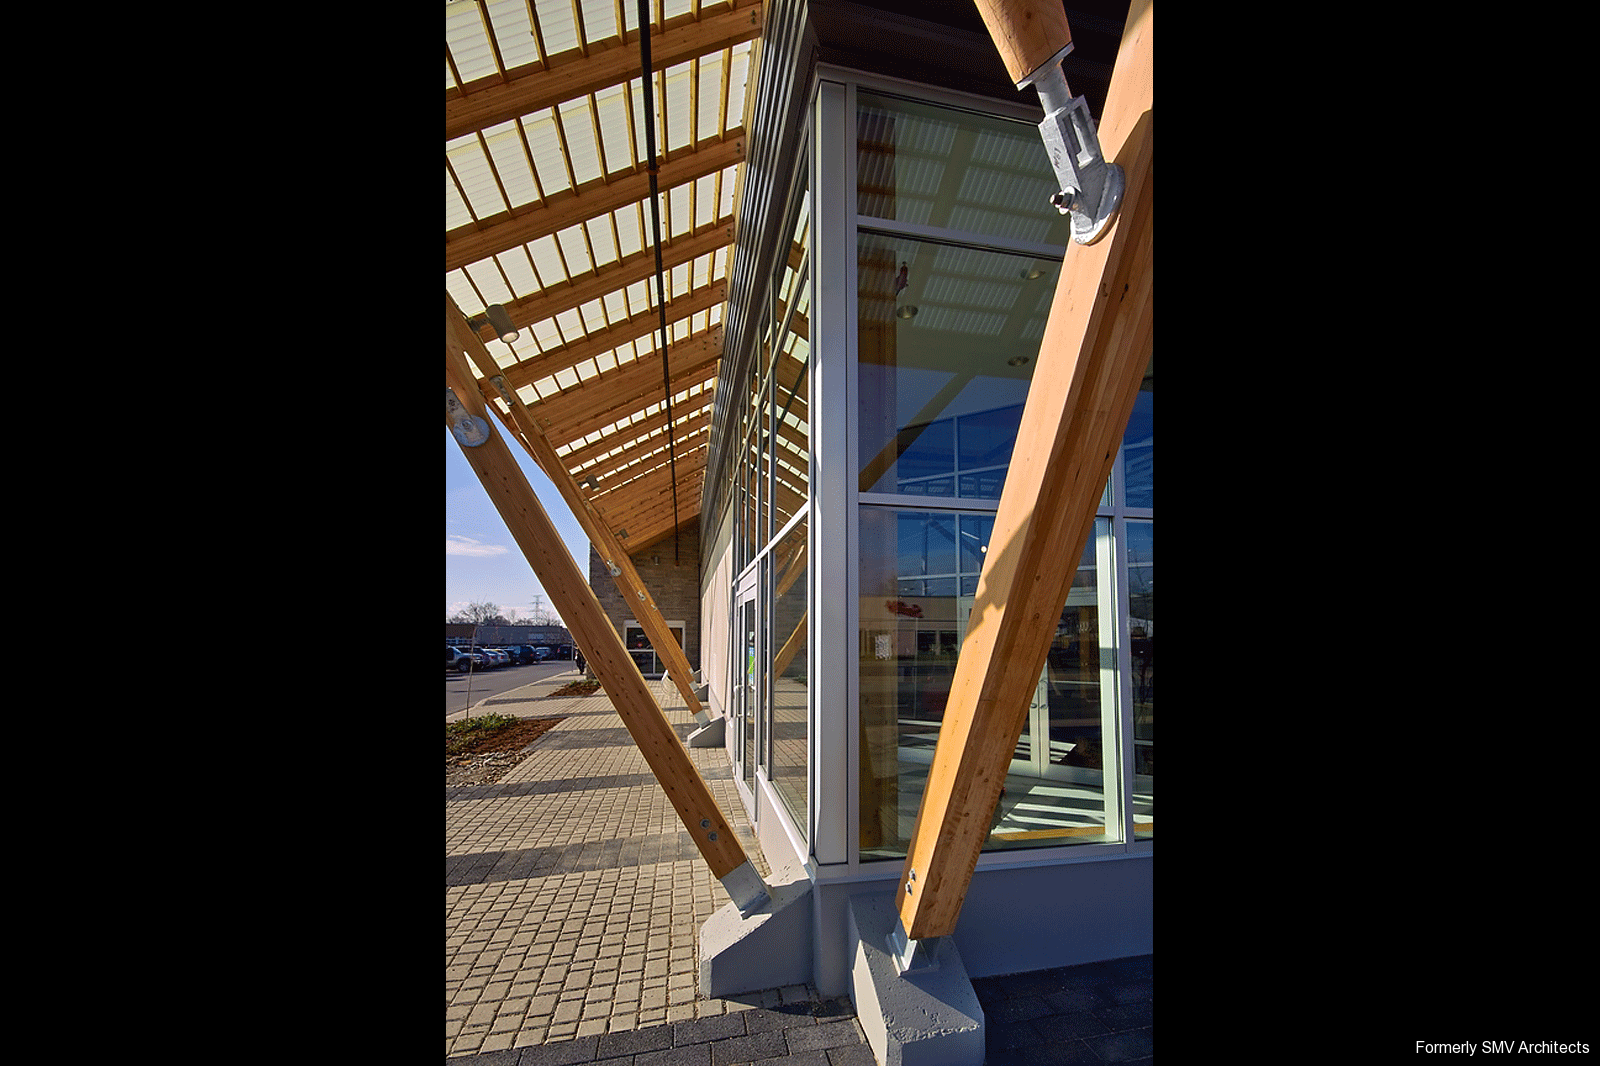 lattice-canopy